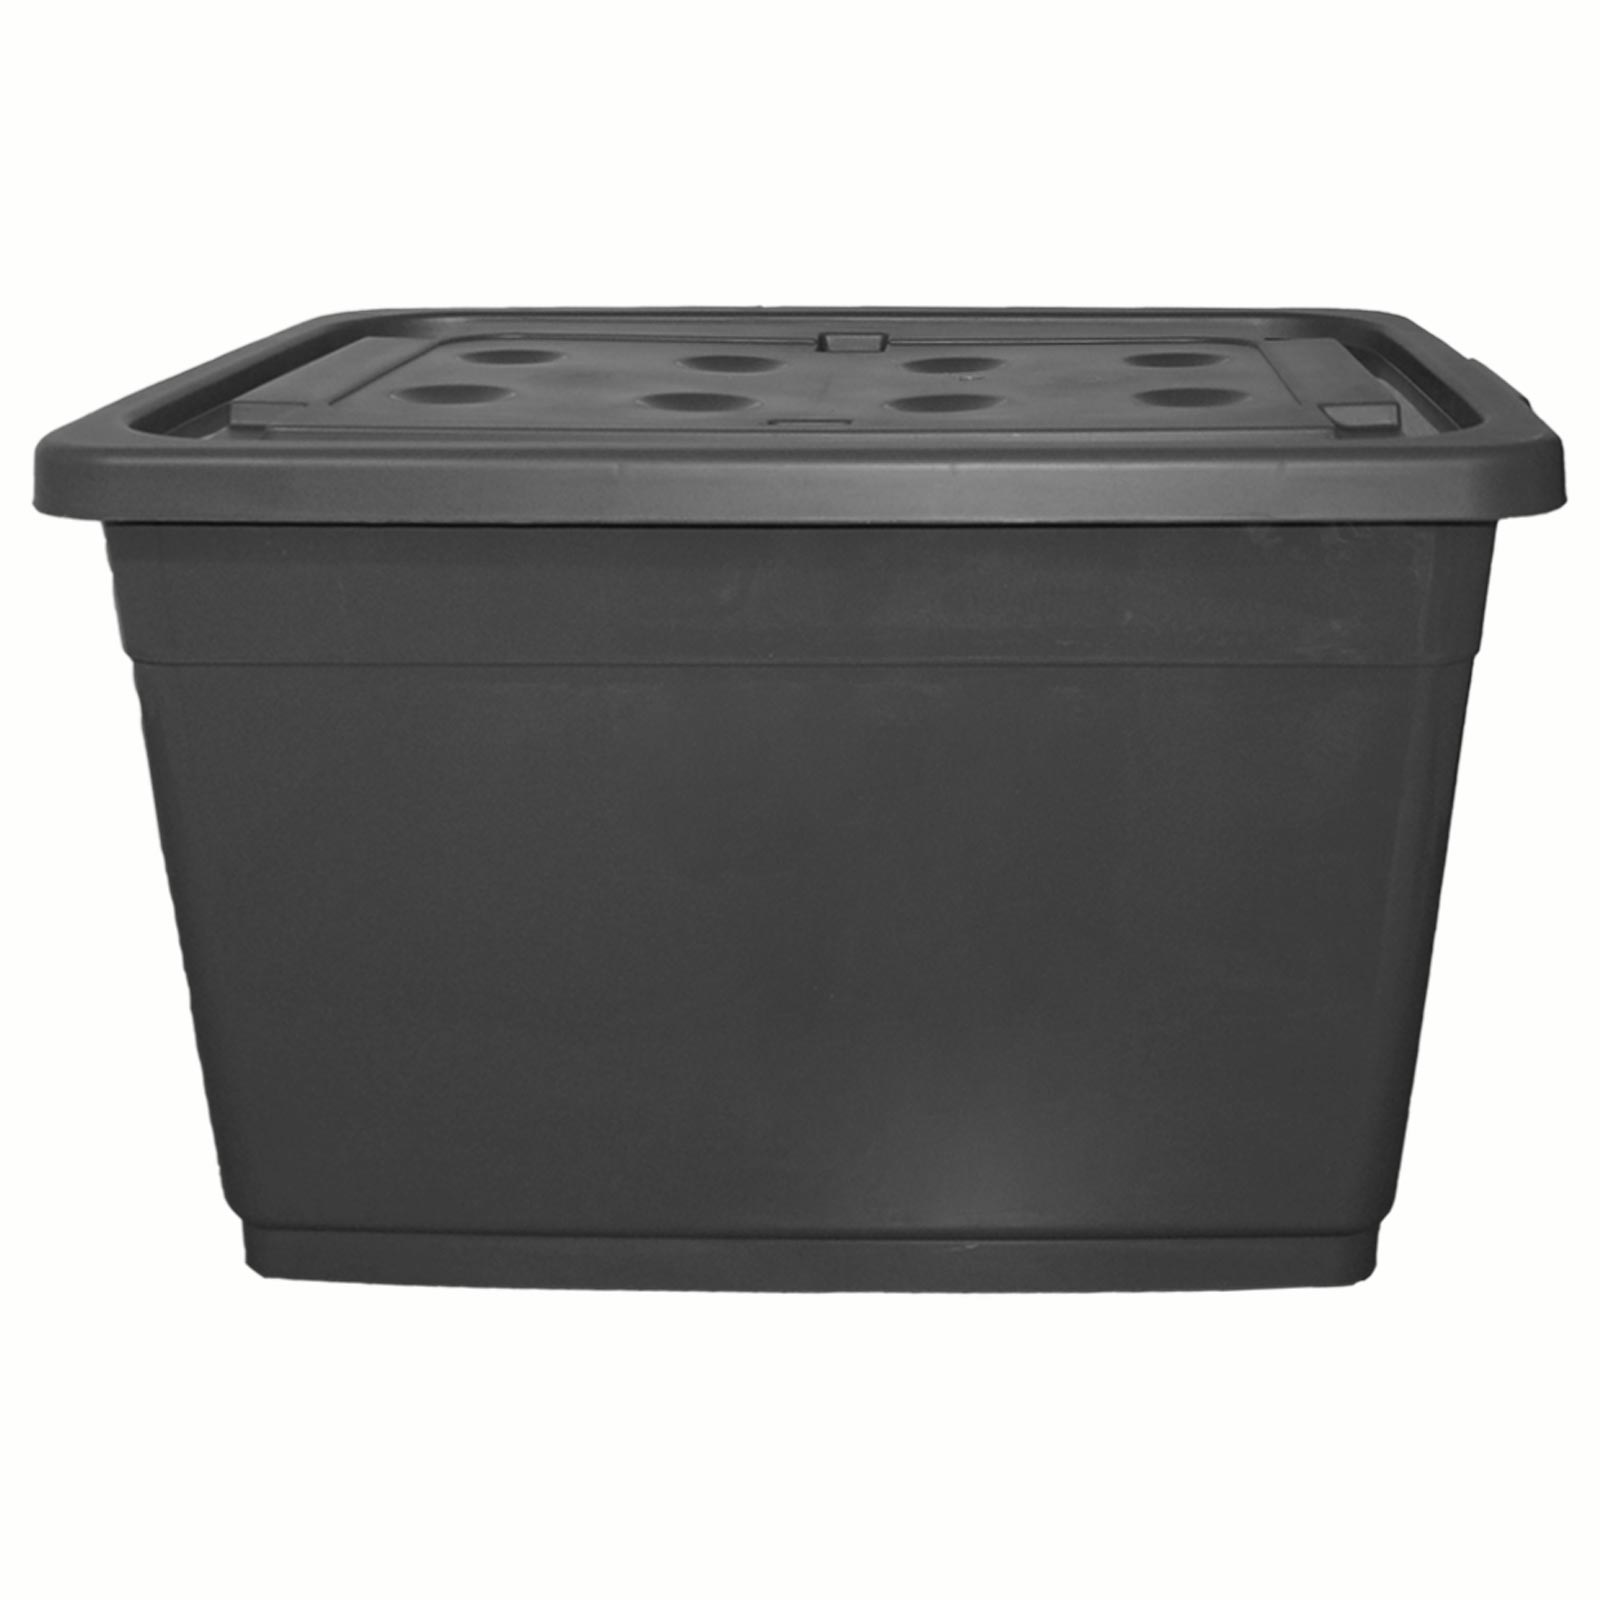 160 liter aufbewahrungsbox grau. Black Bedroom Furniture Sets. Home Design Ideas